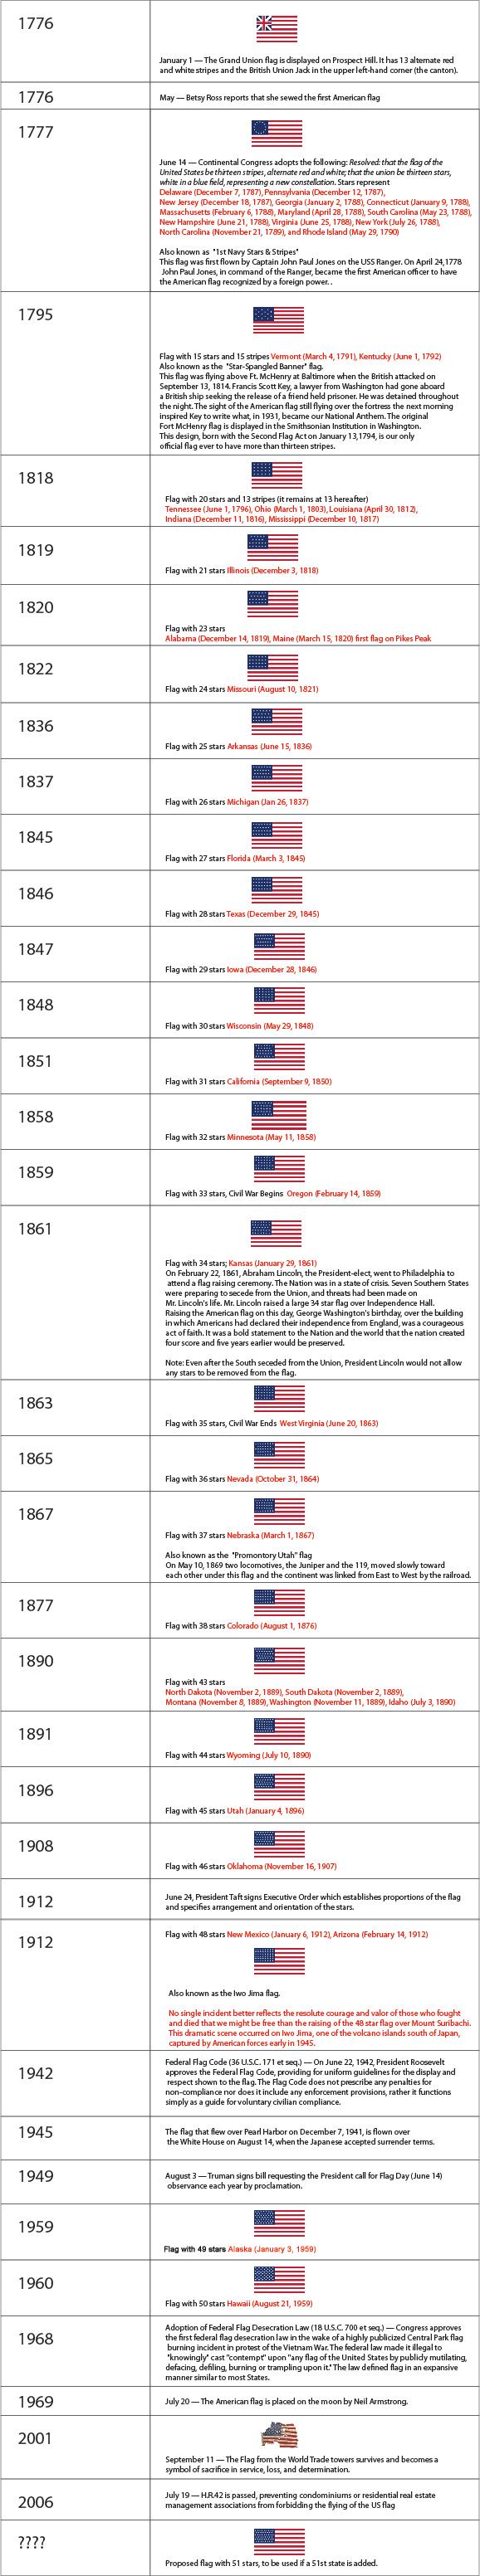 history-of-the-flag.jpg